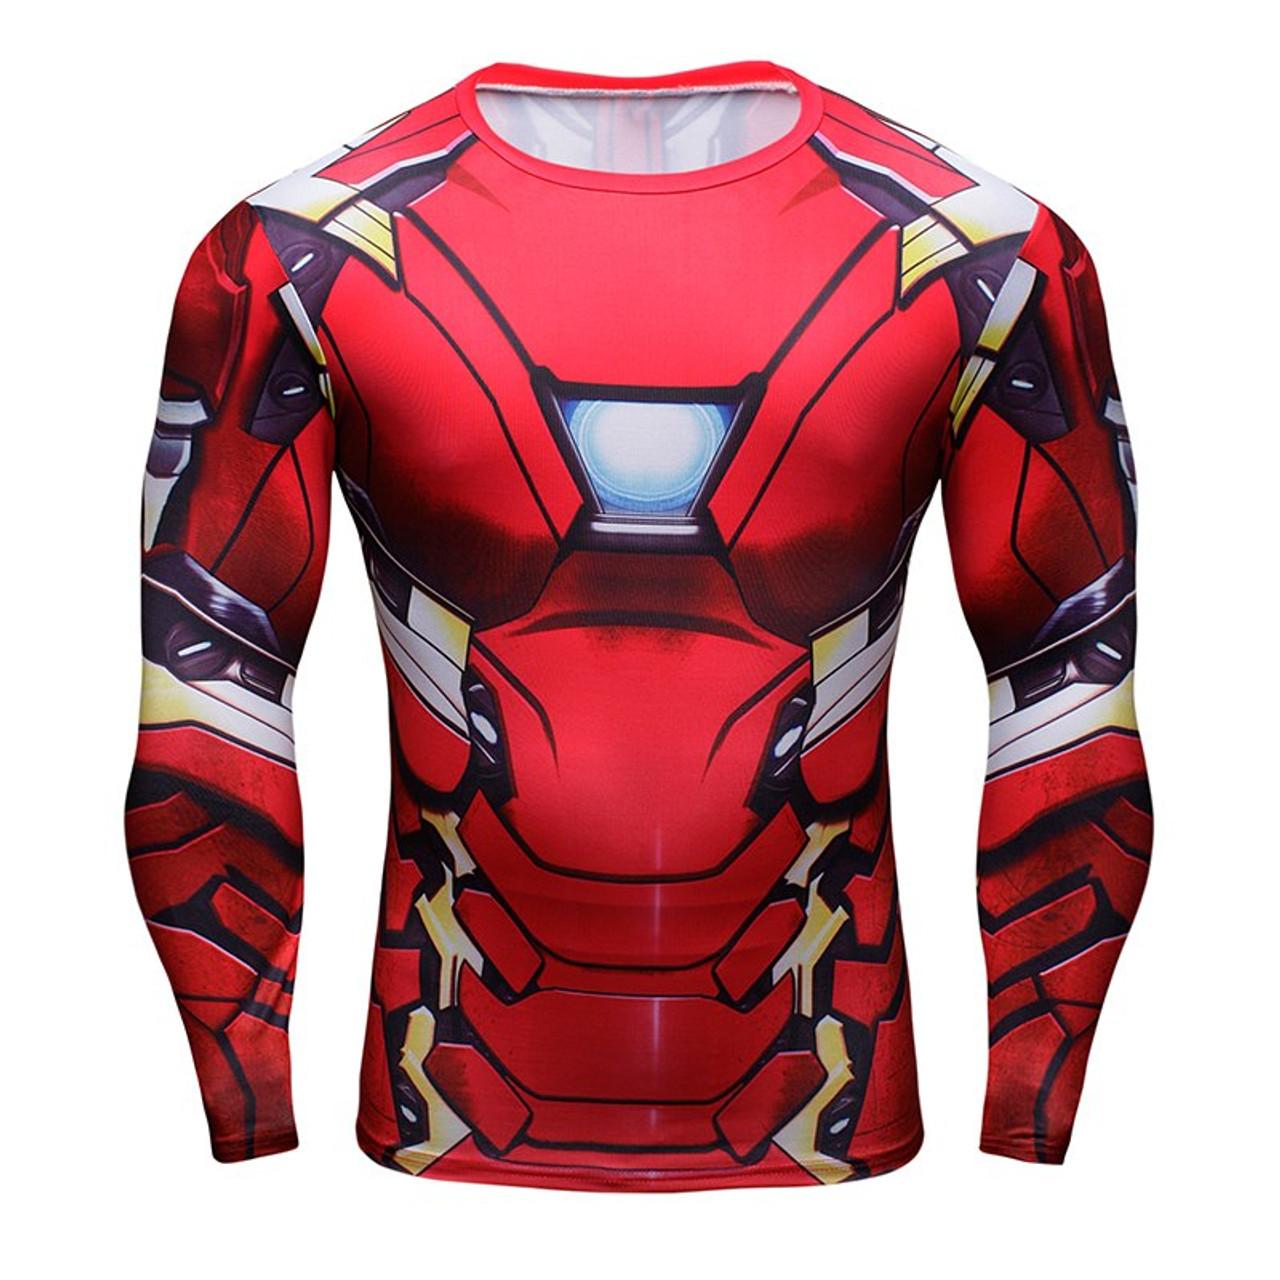 8dee2b8b ... Captain America Fitness 3D Print Long Sleeve T Shirt Men Fashion Brand  Tight Thermal Compression T ...